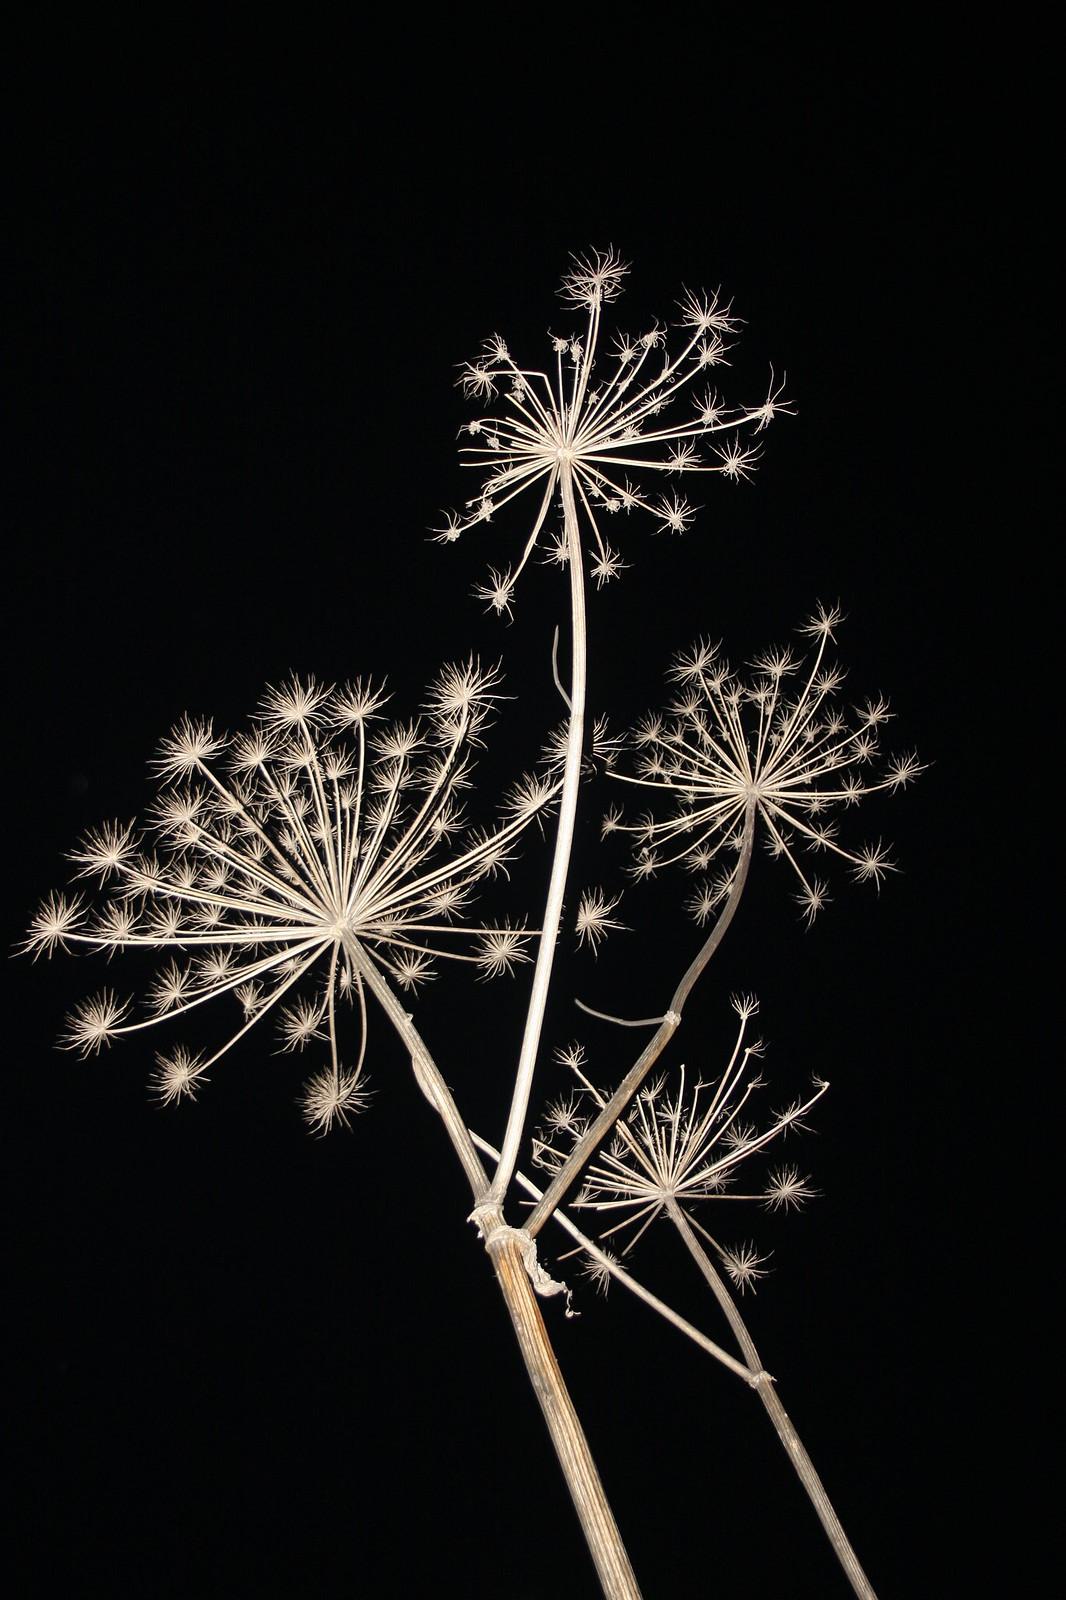 Nazar Furyk fiori